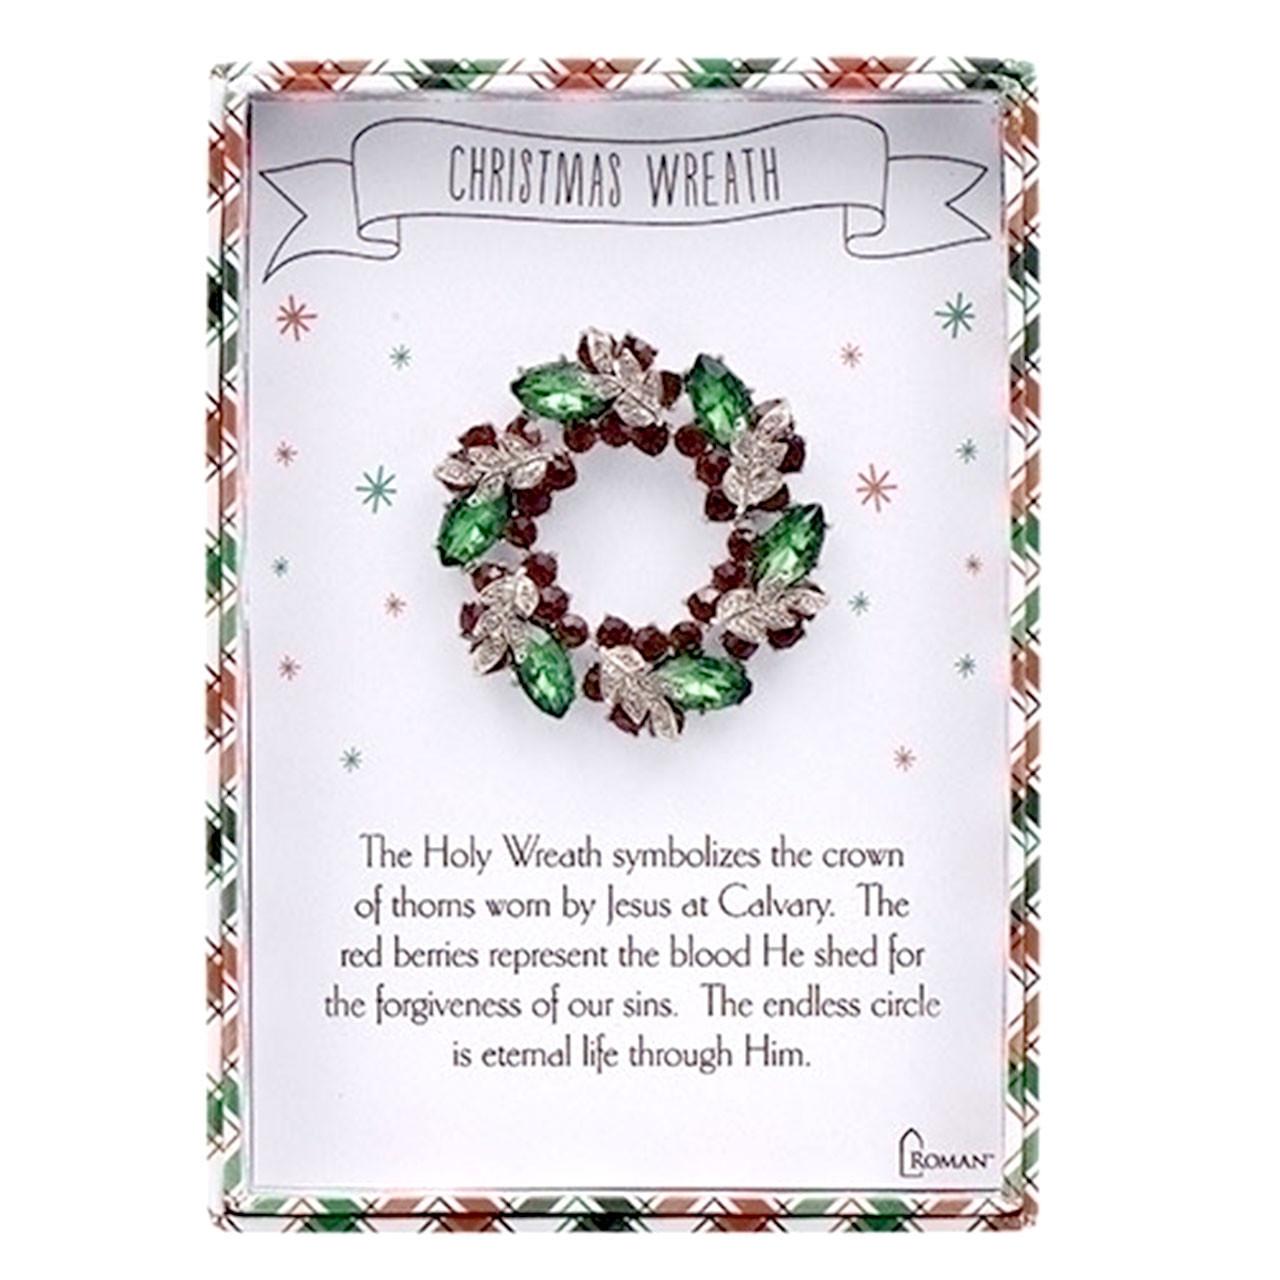 Christmas Wreath Story Jewelry Pin